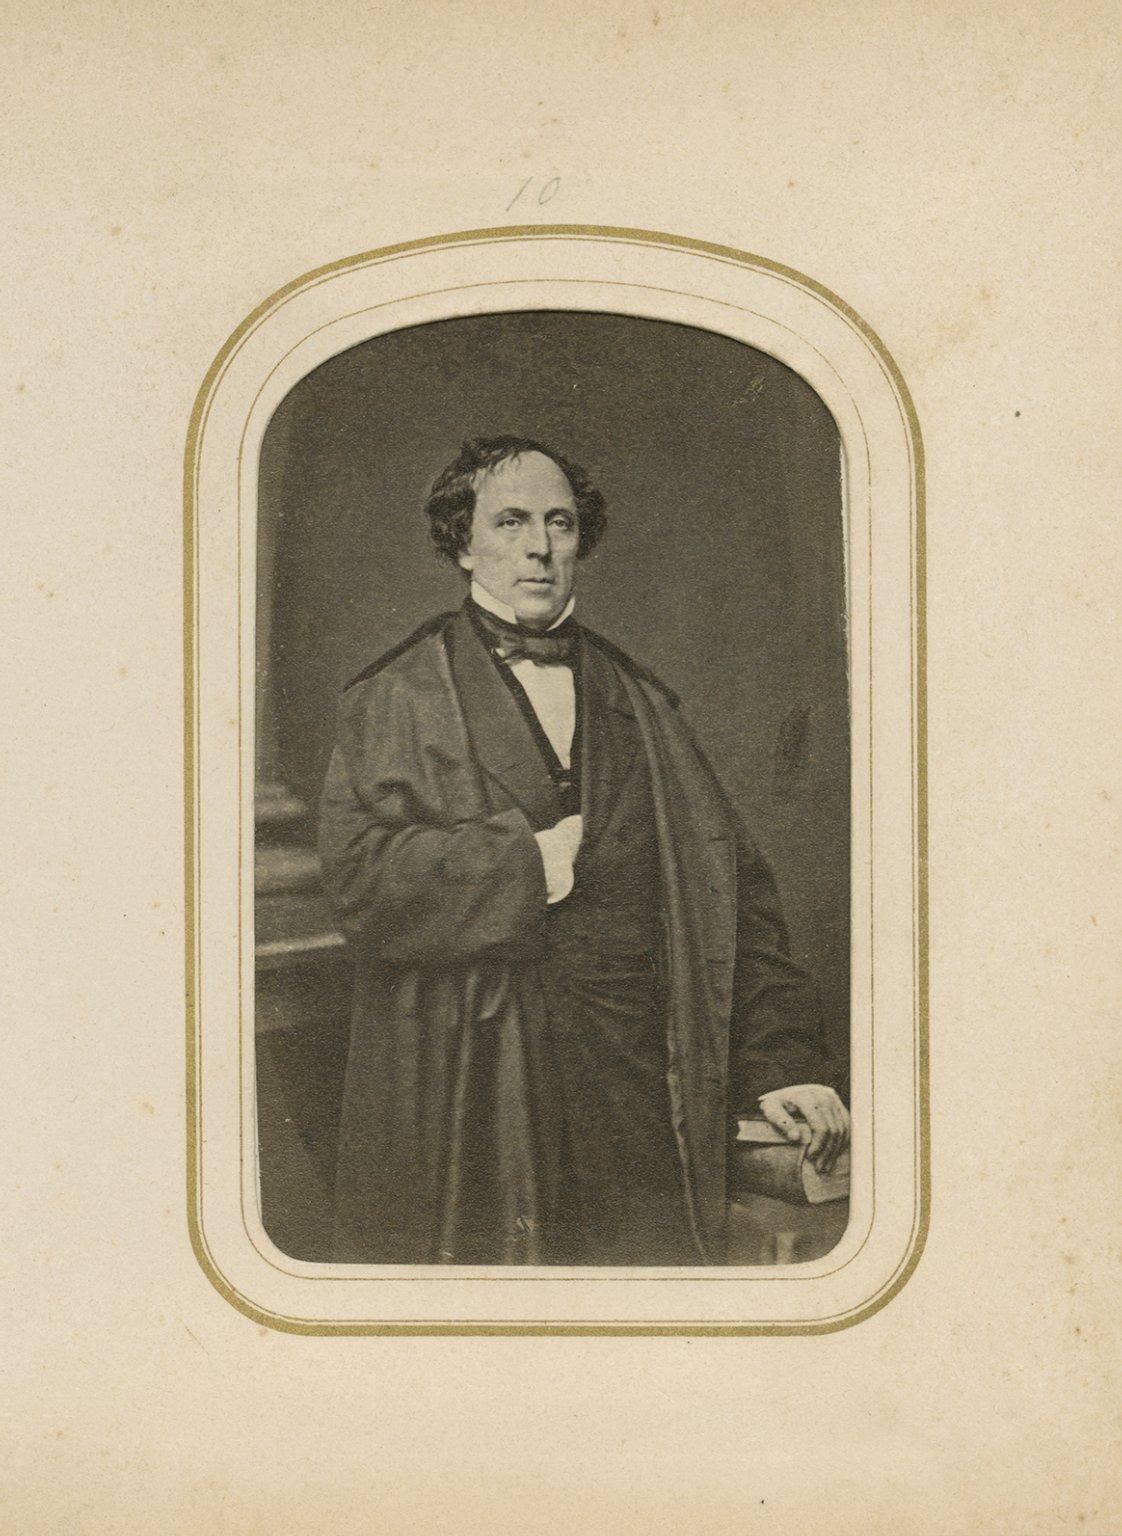 Gen. John B. Floyd